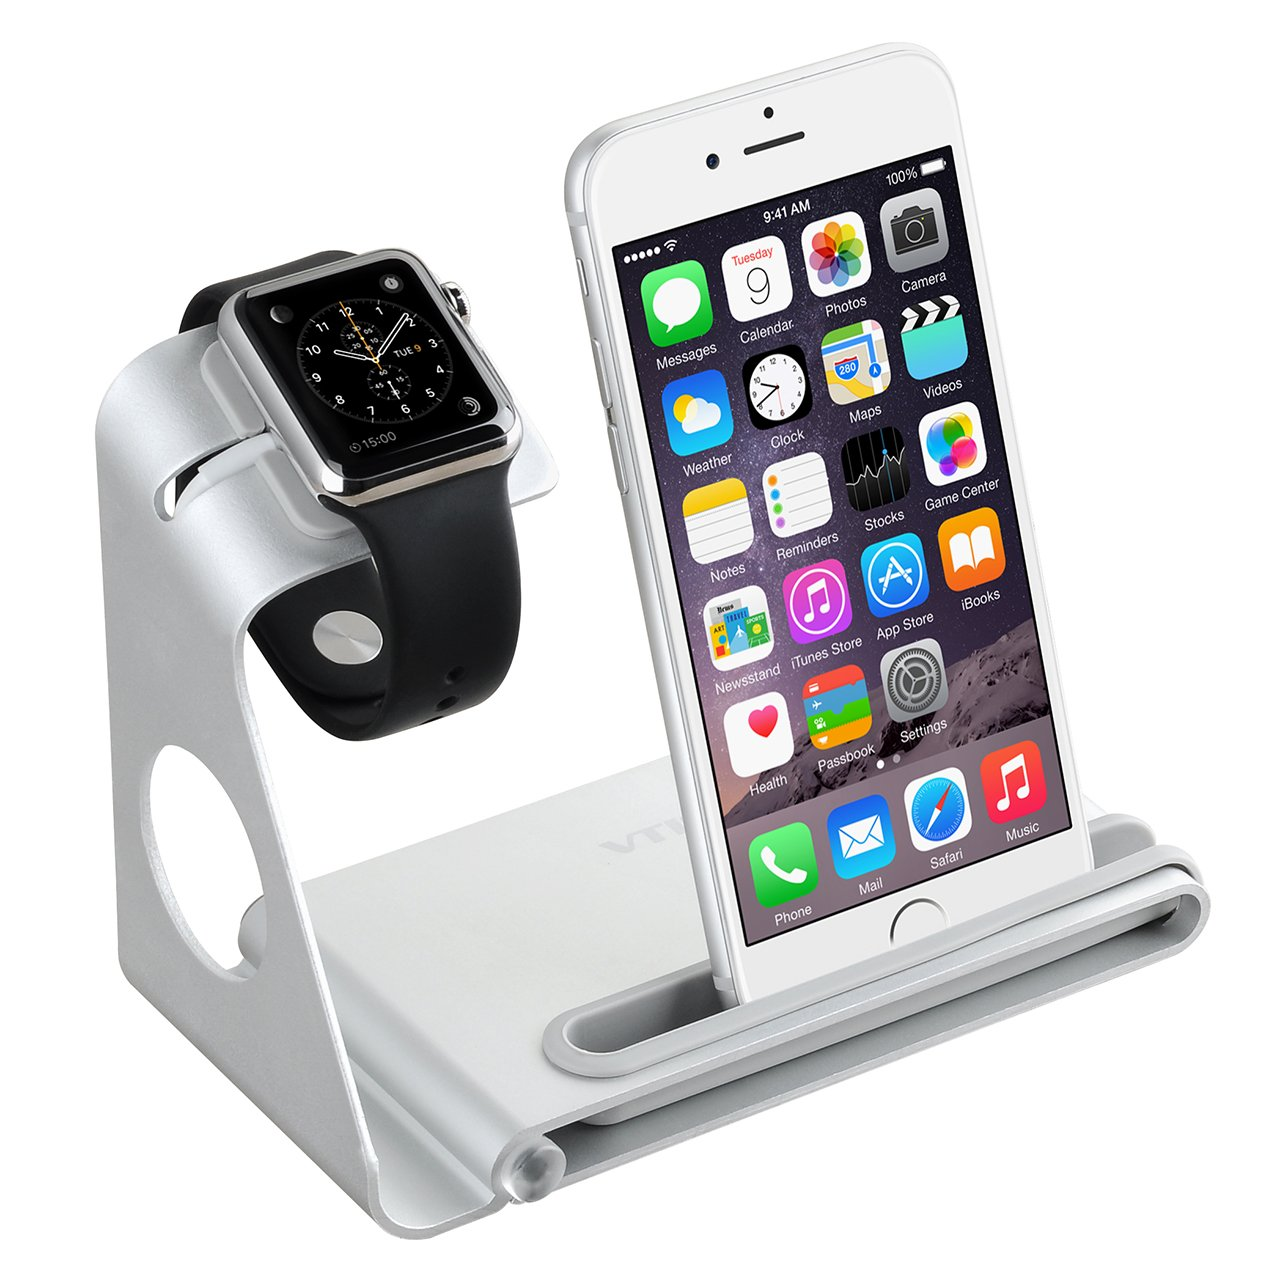 VTin DuoStand Charge Station/stand de Aleación de aluminio/ soporte del cargador / Desk Stand Cradle para Apple Watch 38/42 mm & iPhone o otros ...